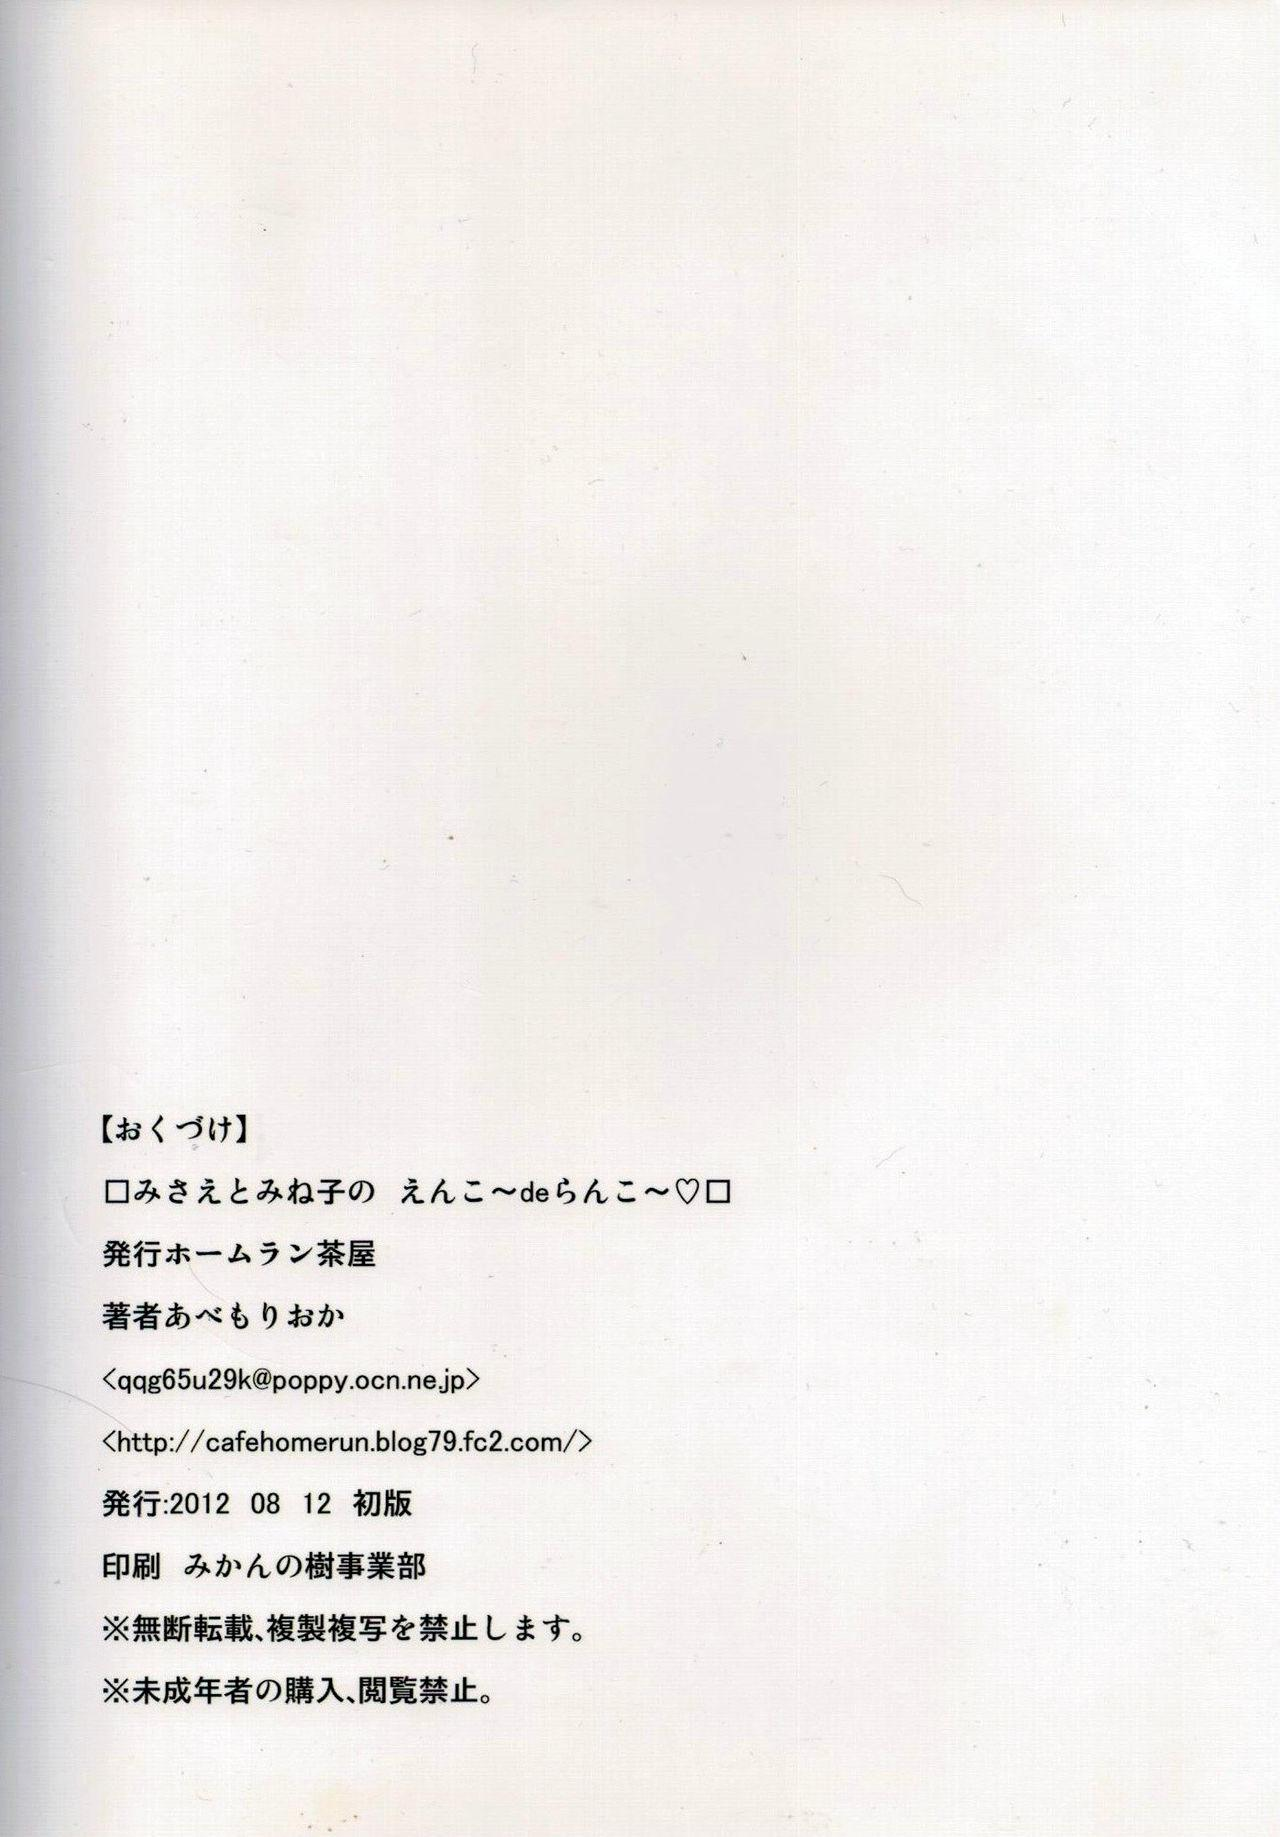 Misae to Mineko no Enkou de Rankou    美冴和峰子的援交~淫亂盛宴~ 23